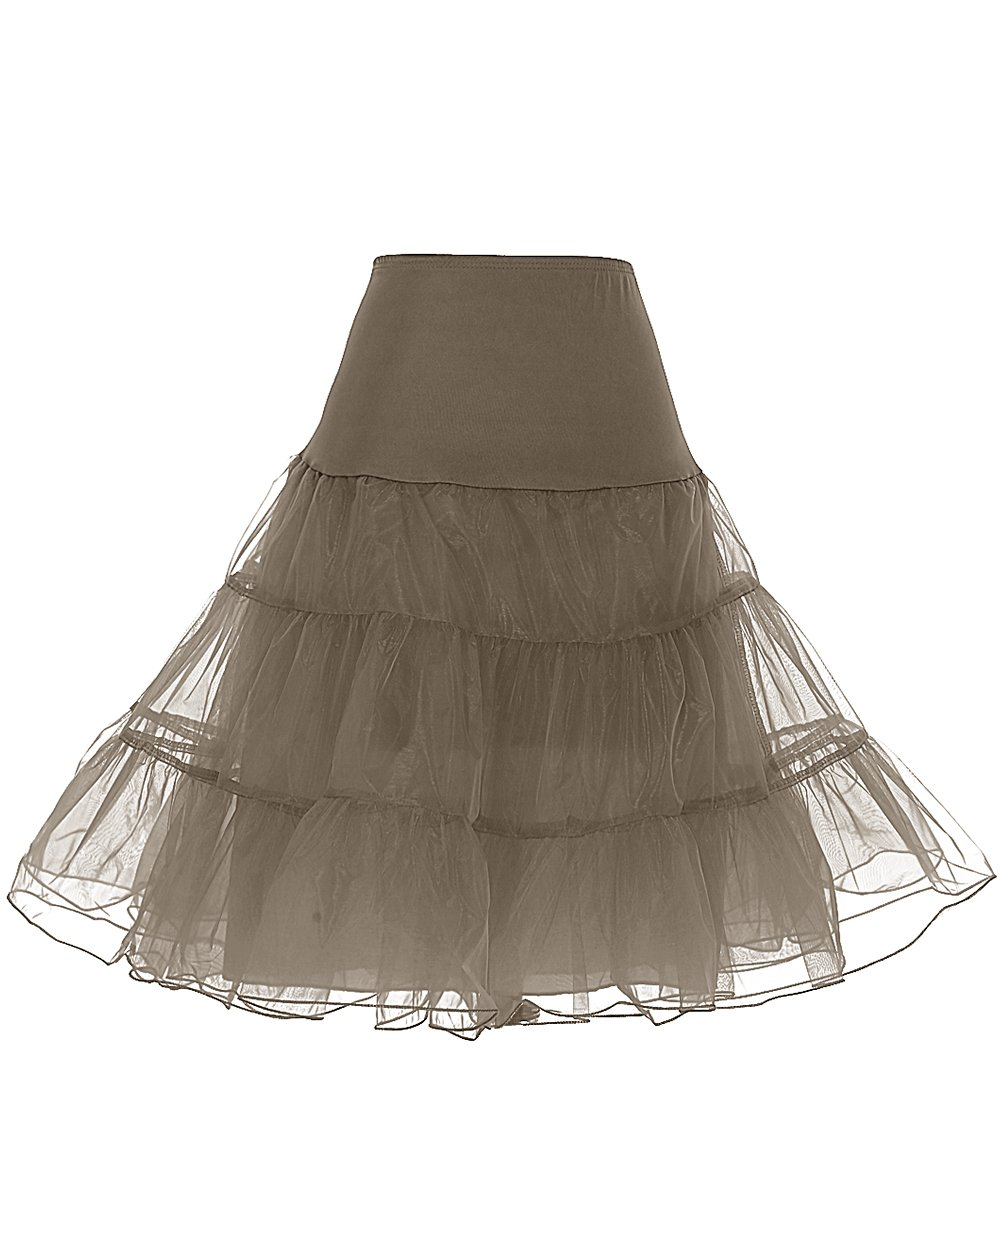 Dresstells reg; Women's Vintage Rockabilly Petticoat Skirt Tutu 1950s Underskirt DT9120632CP